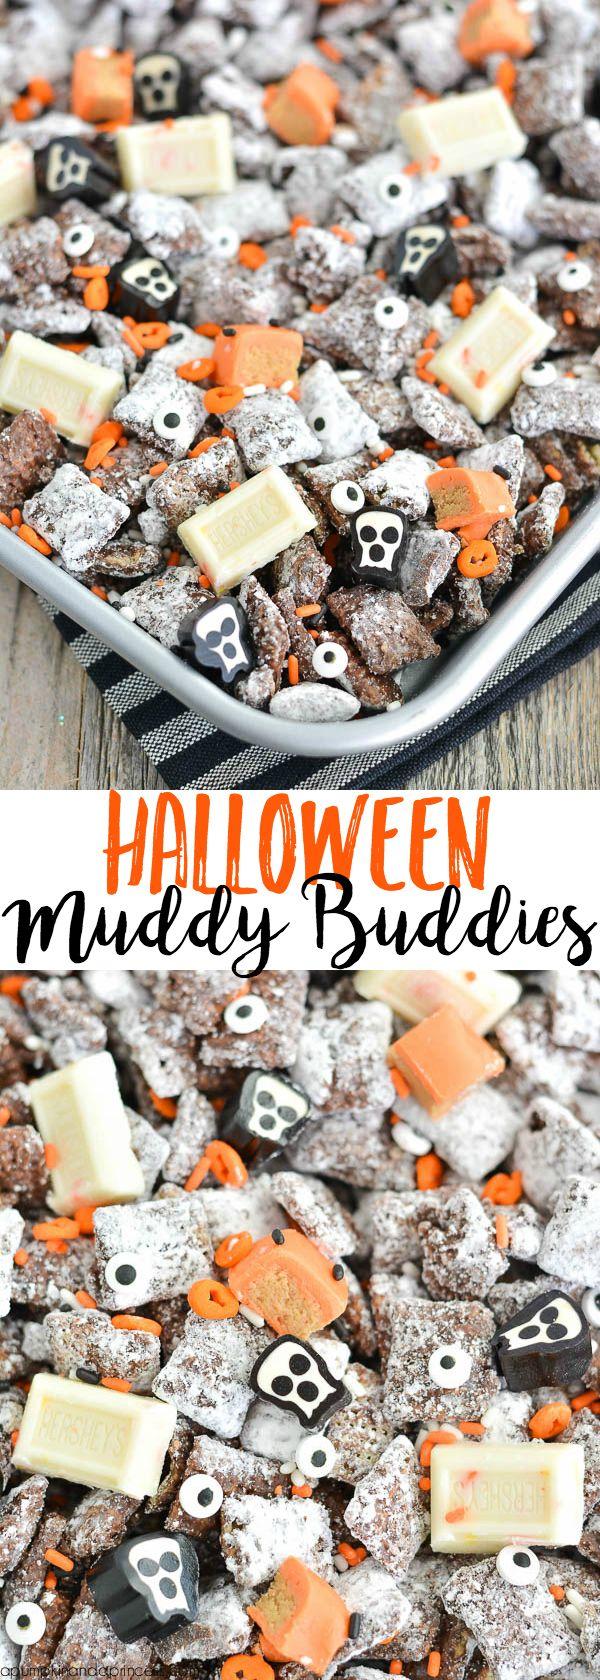 halloween treat ideas toddlers